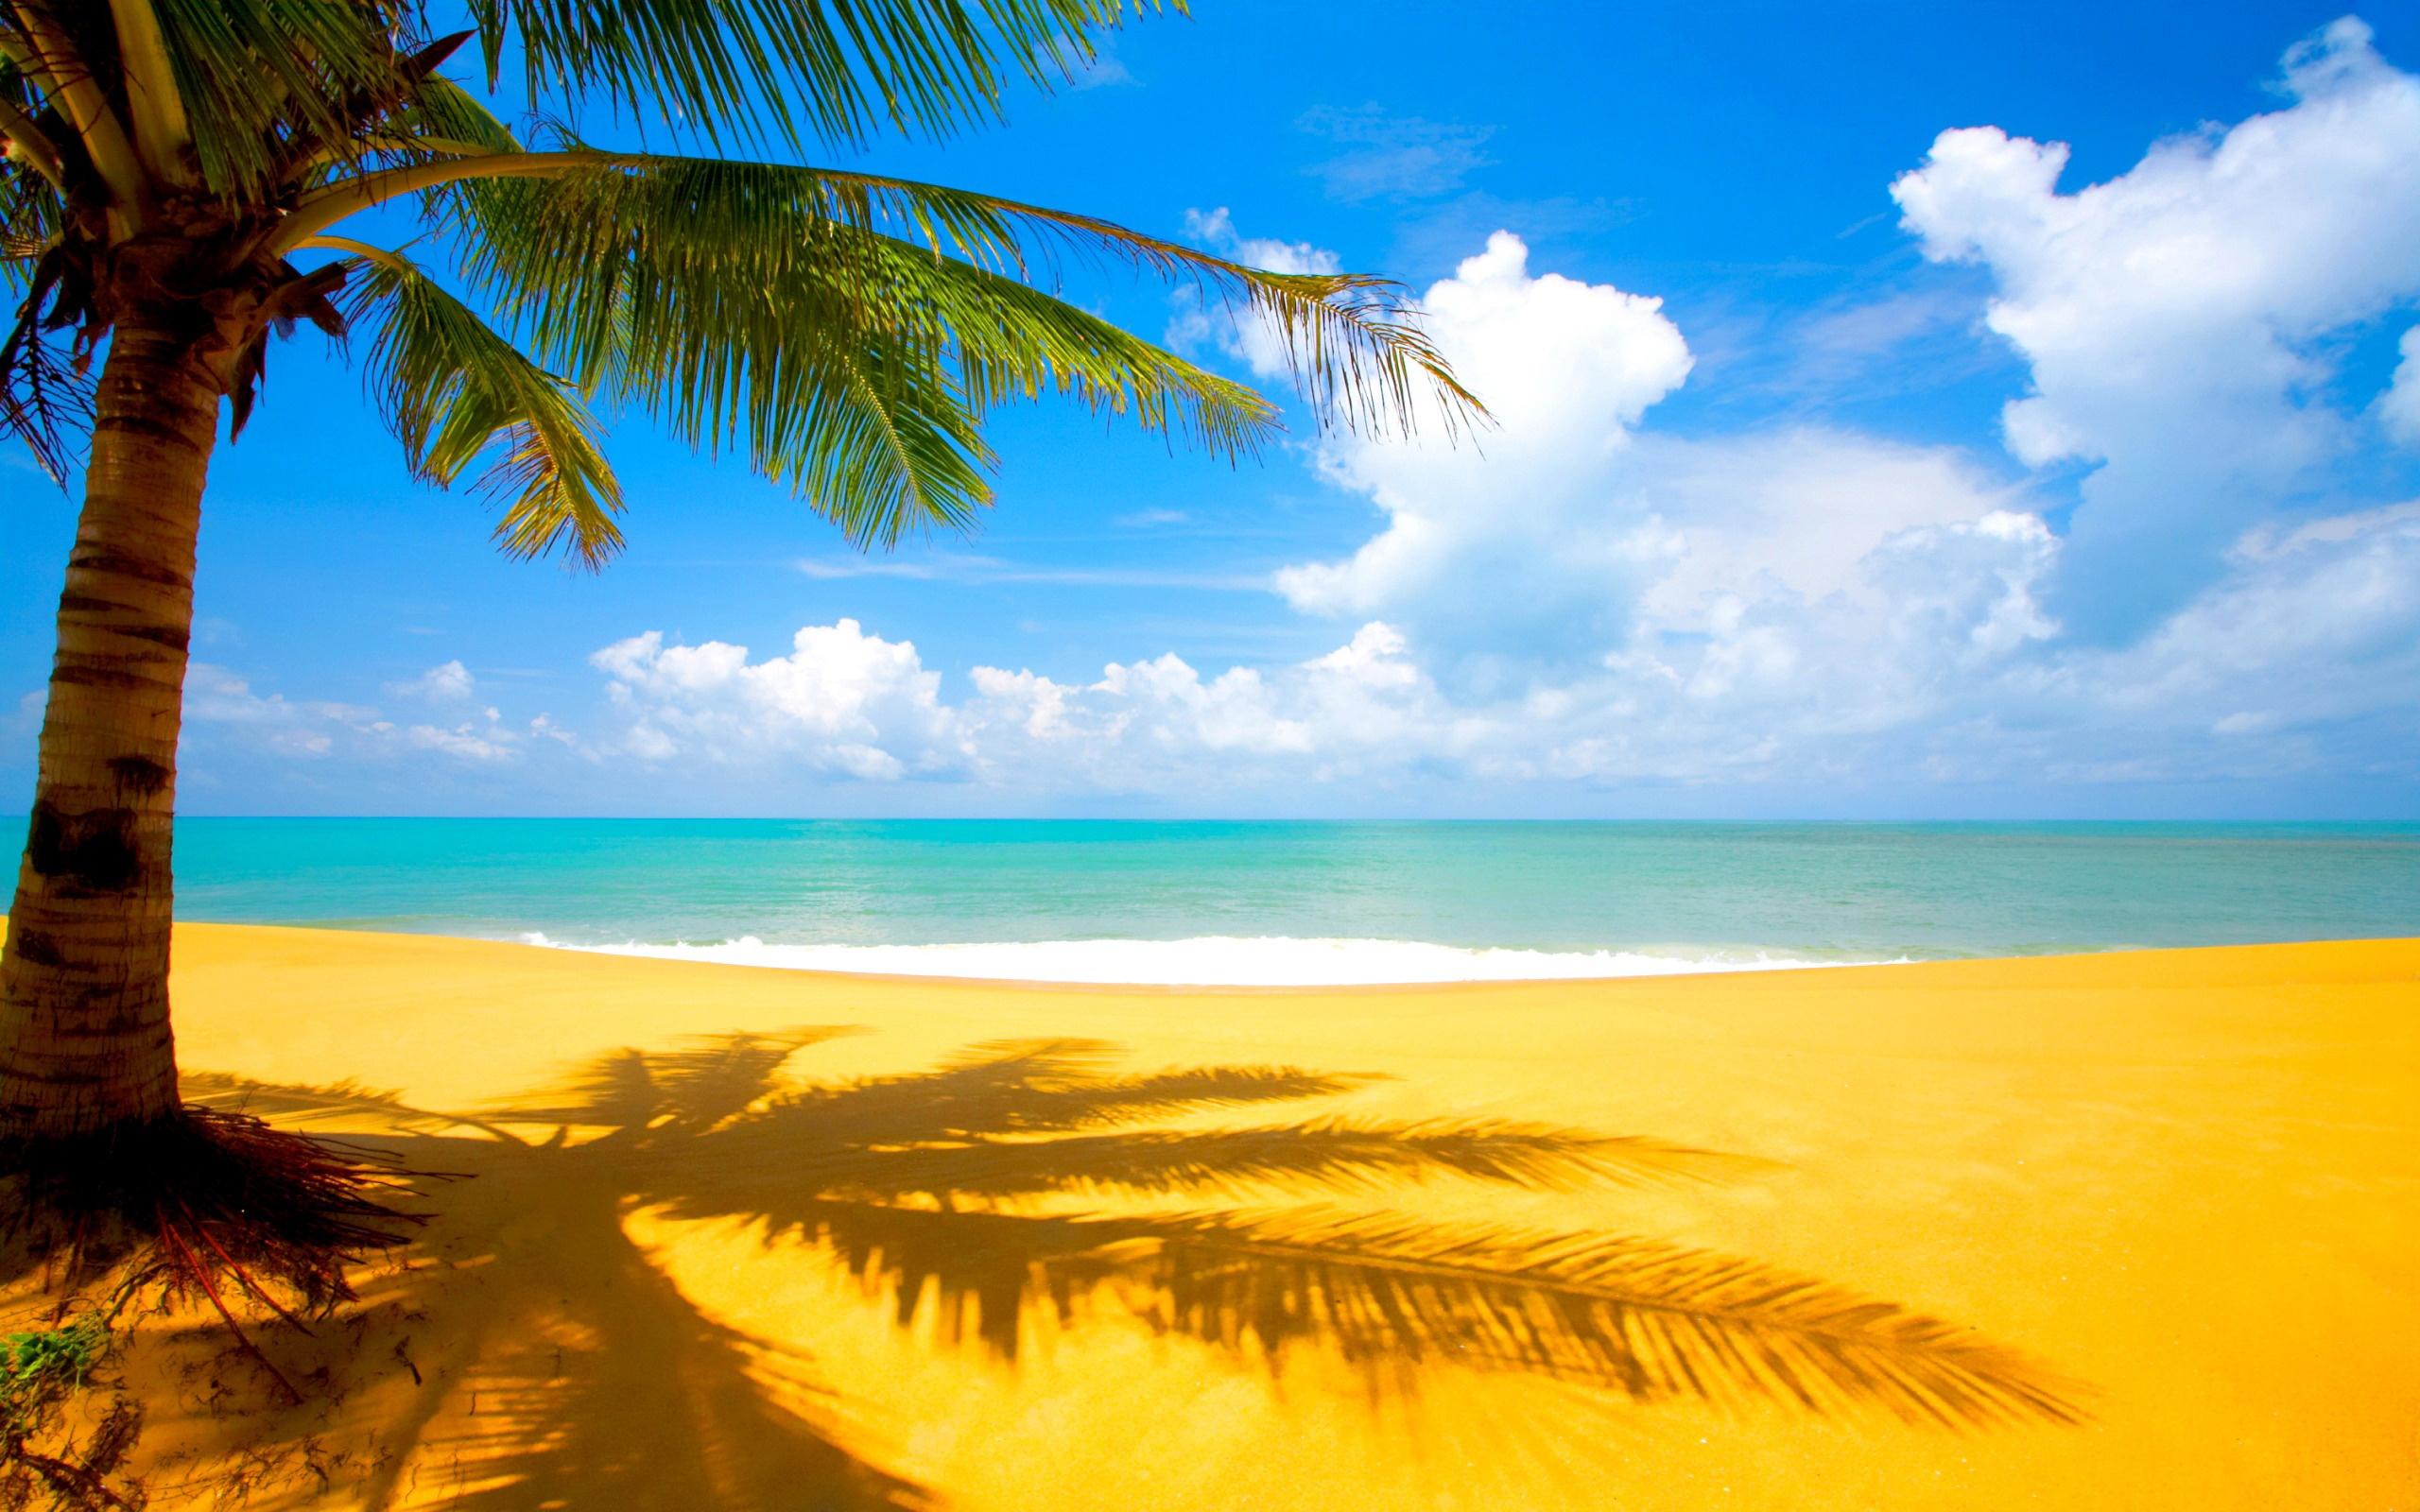 Ocean beach Desktop Wallpapers FREE on Latorocom 2560x1600